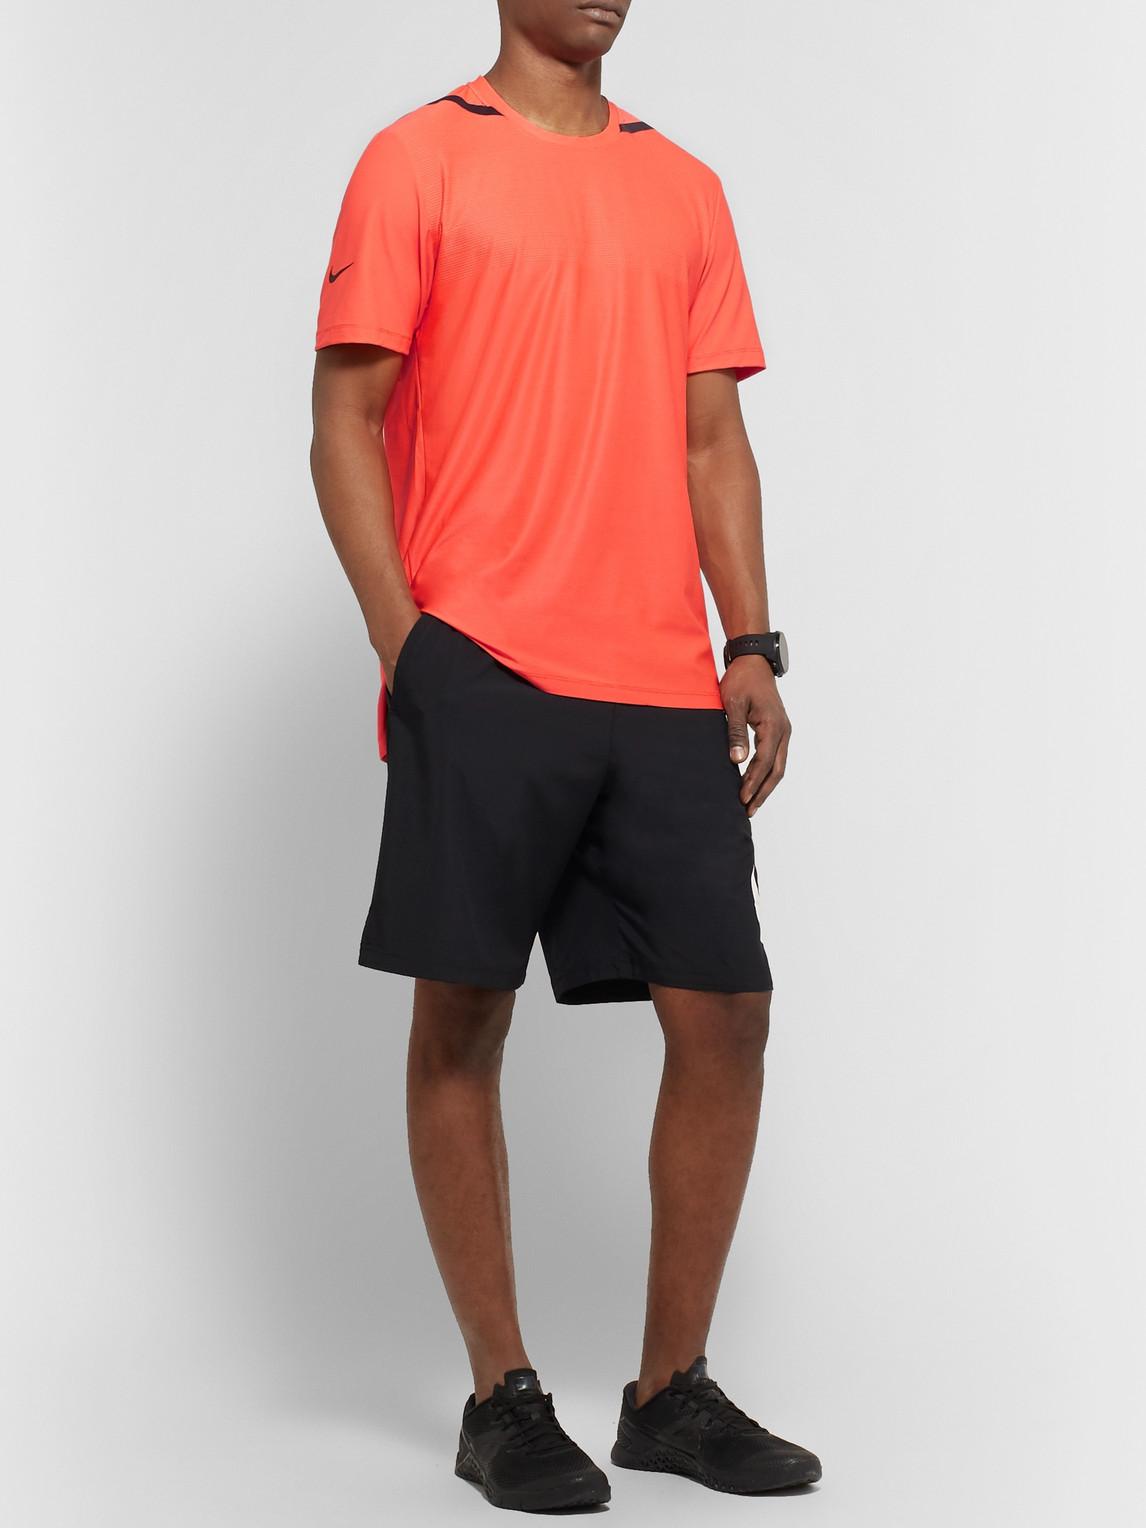 Nike Tops TECH PACK MESH